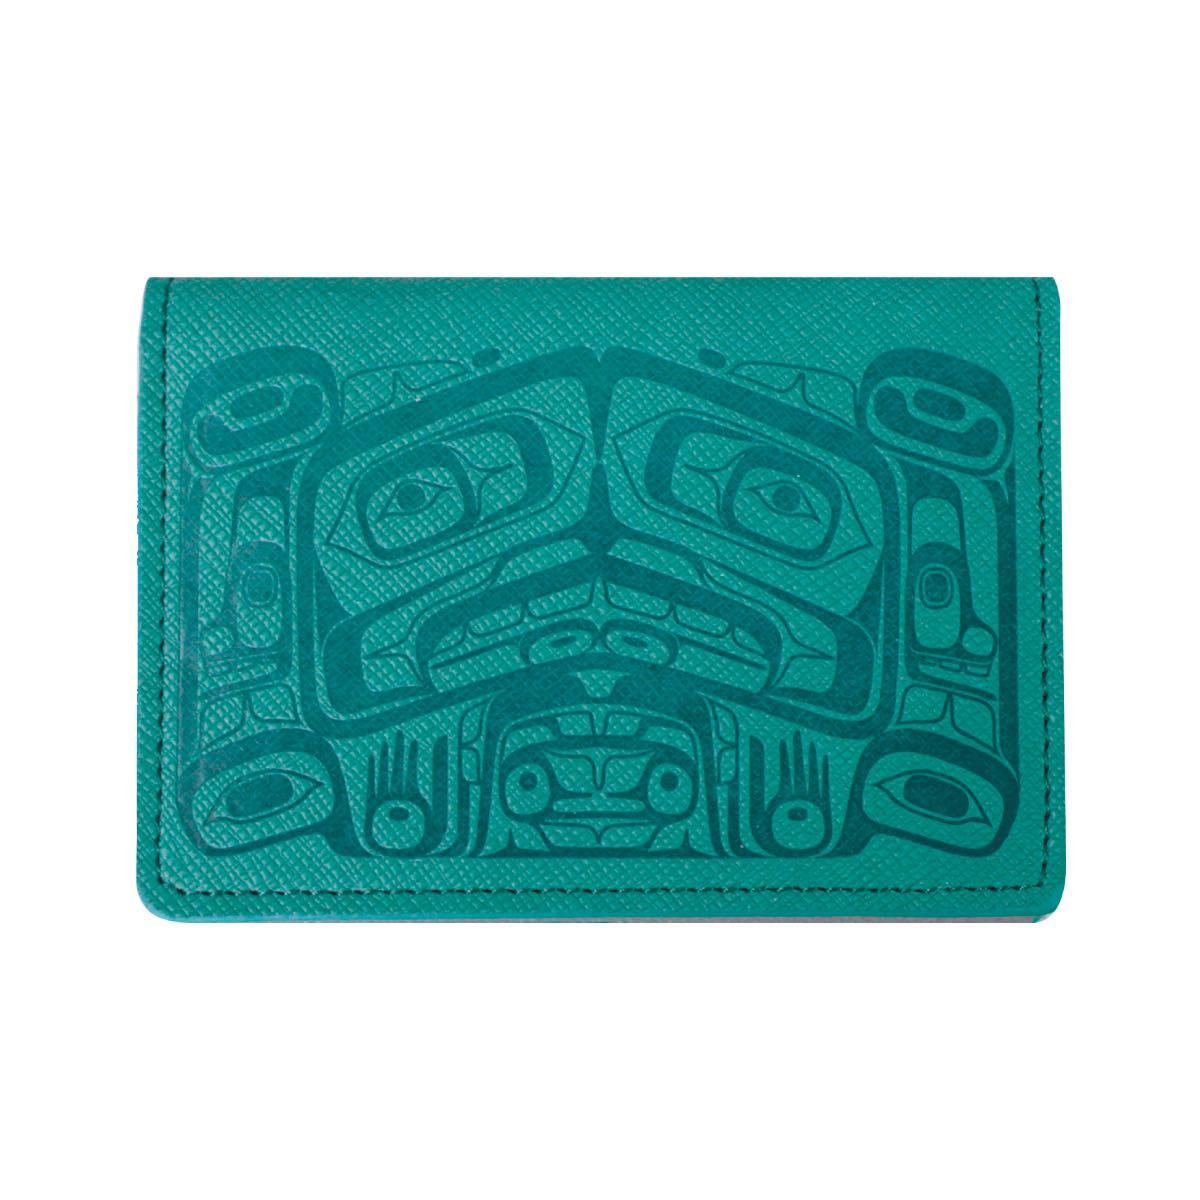 Card Wallet-Raven Box by Allan Weir-7